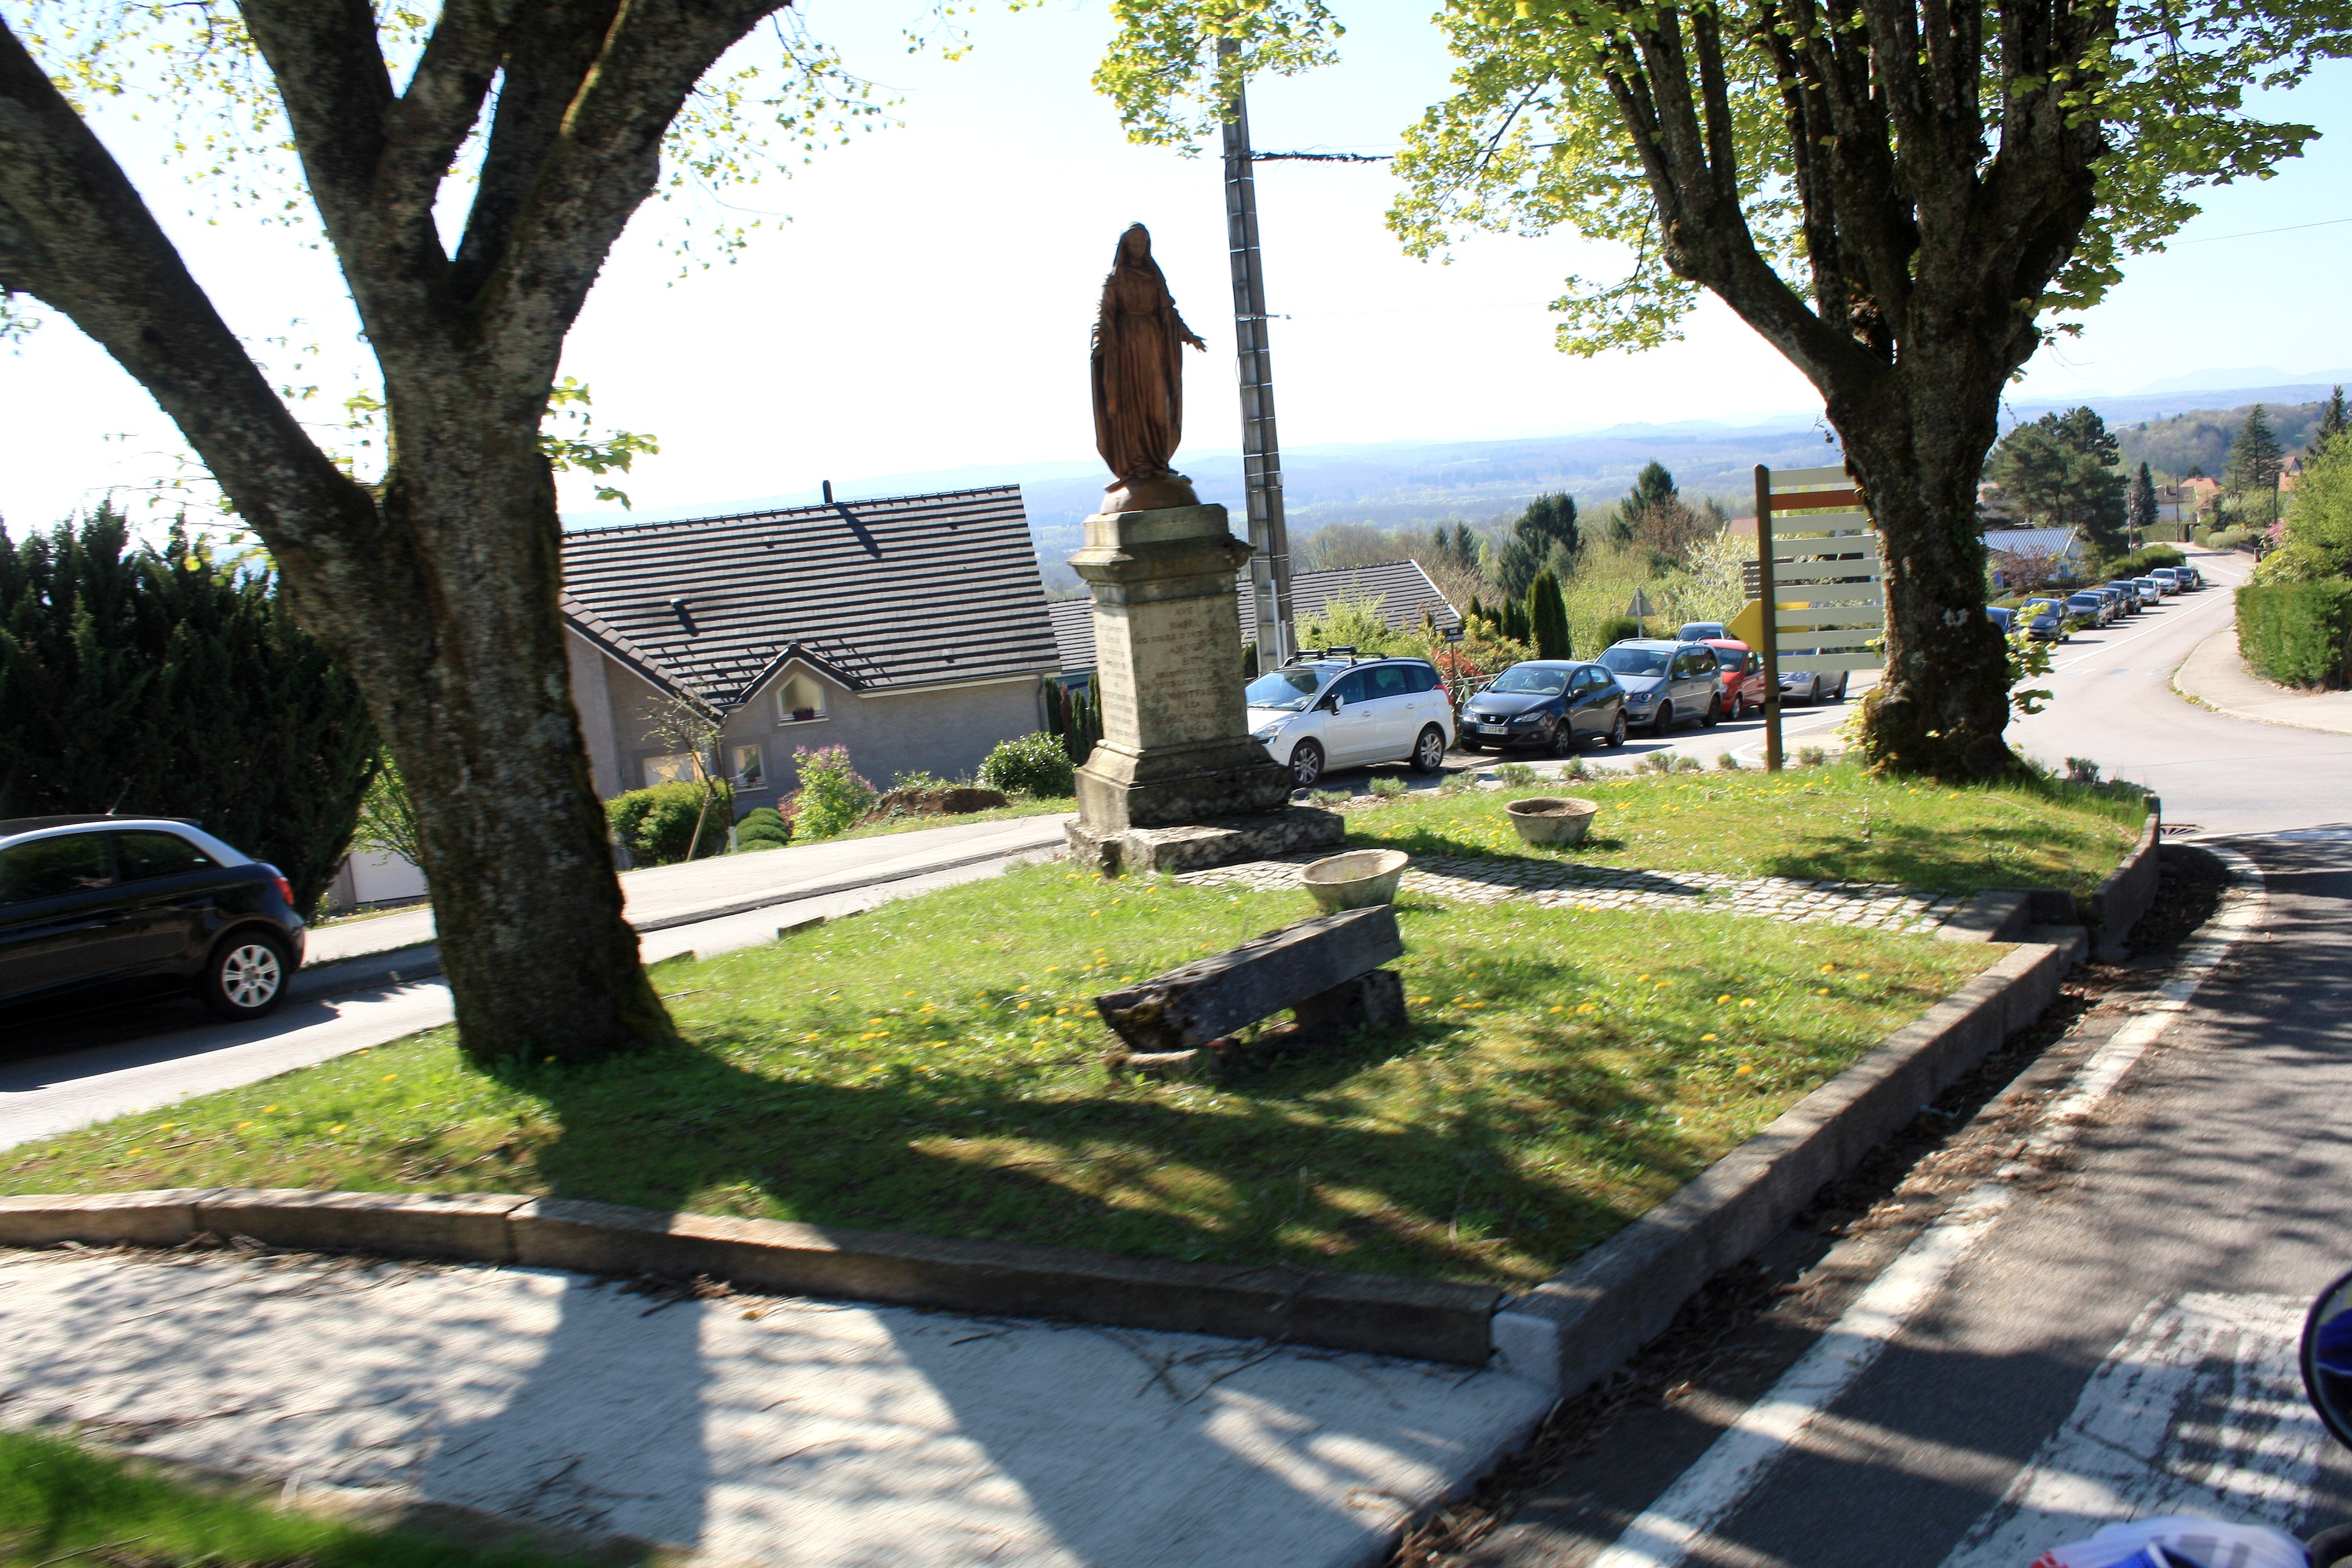 2017-04-09 - Trail-Montfaucon (333)